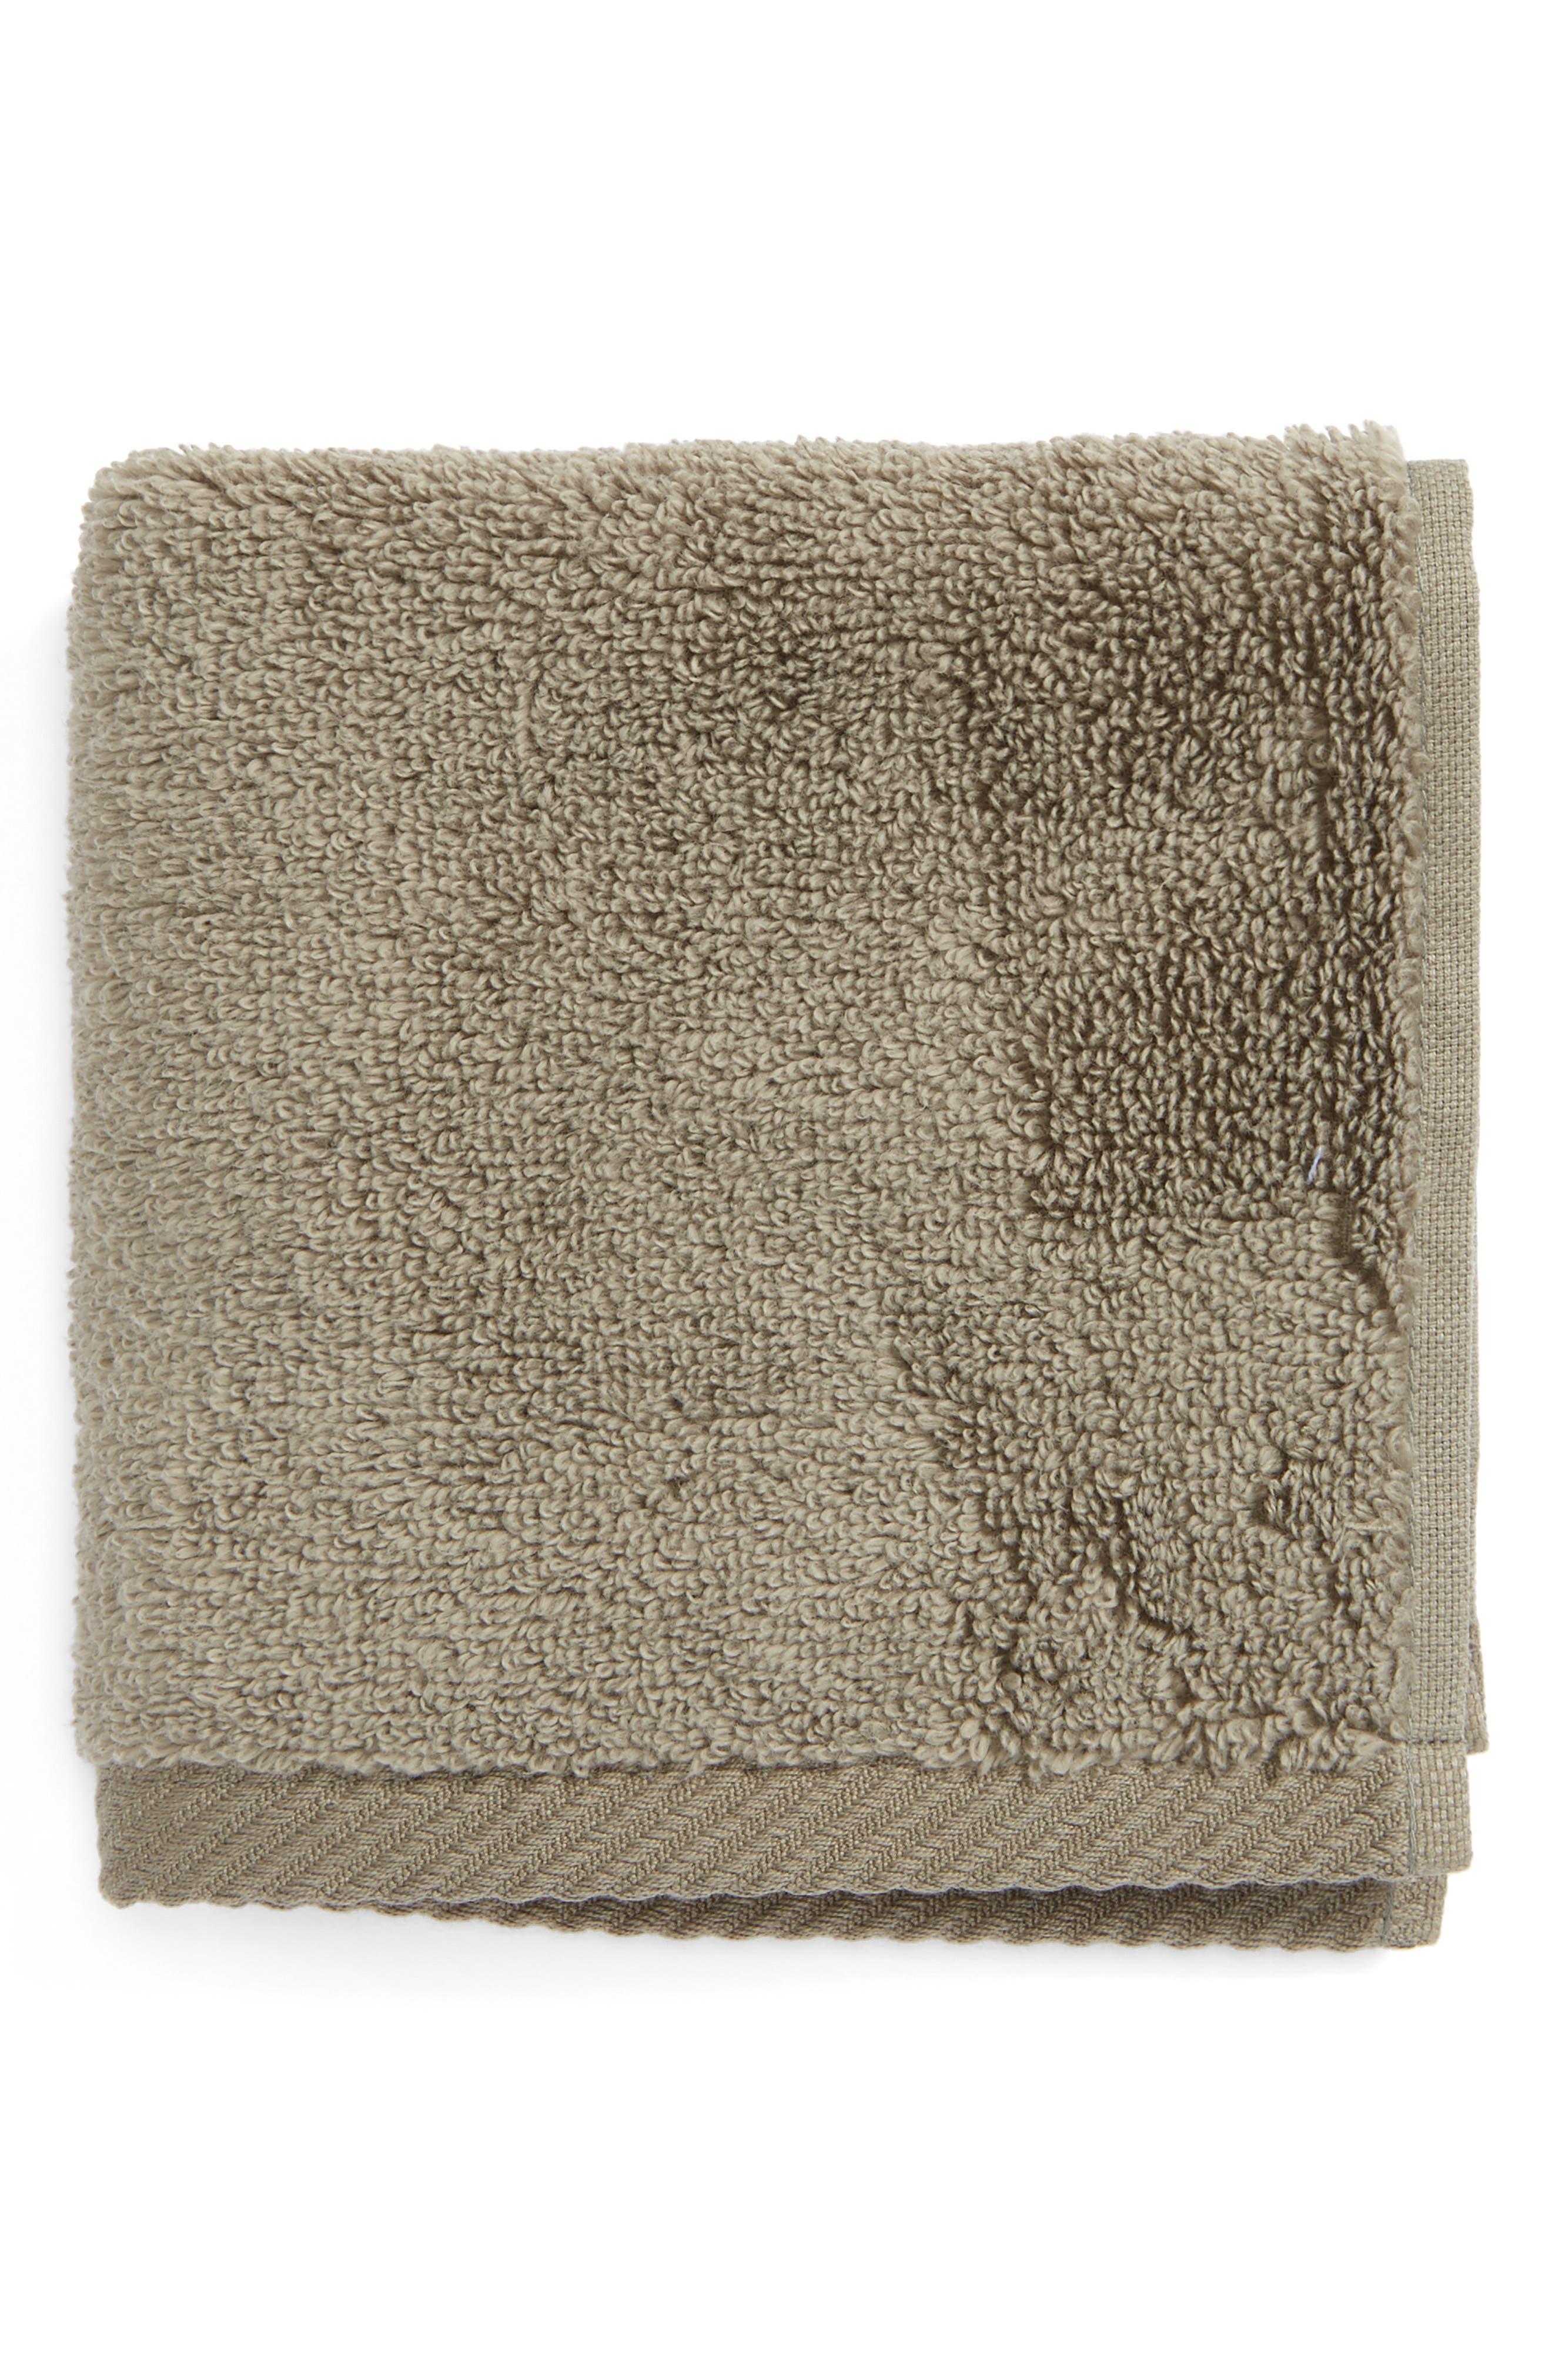 Milagro Washcloth,                         Main,                         color, STEEL